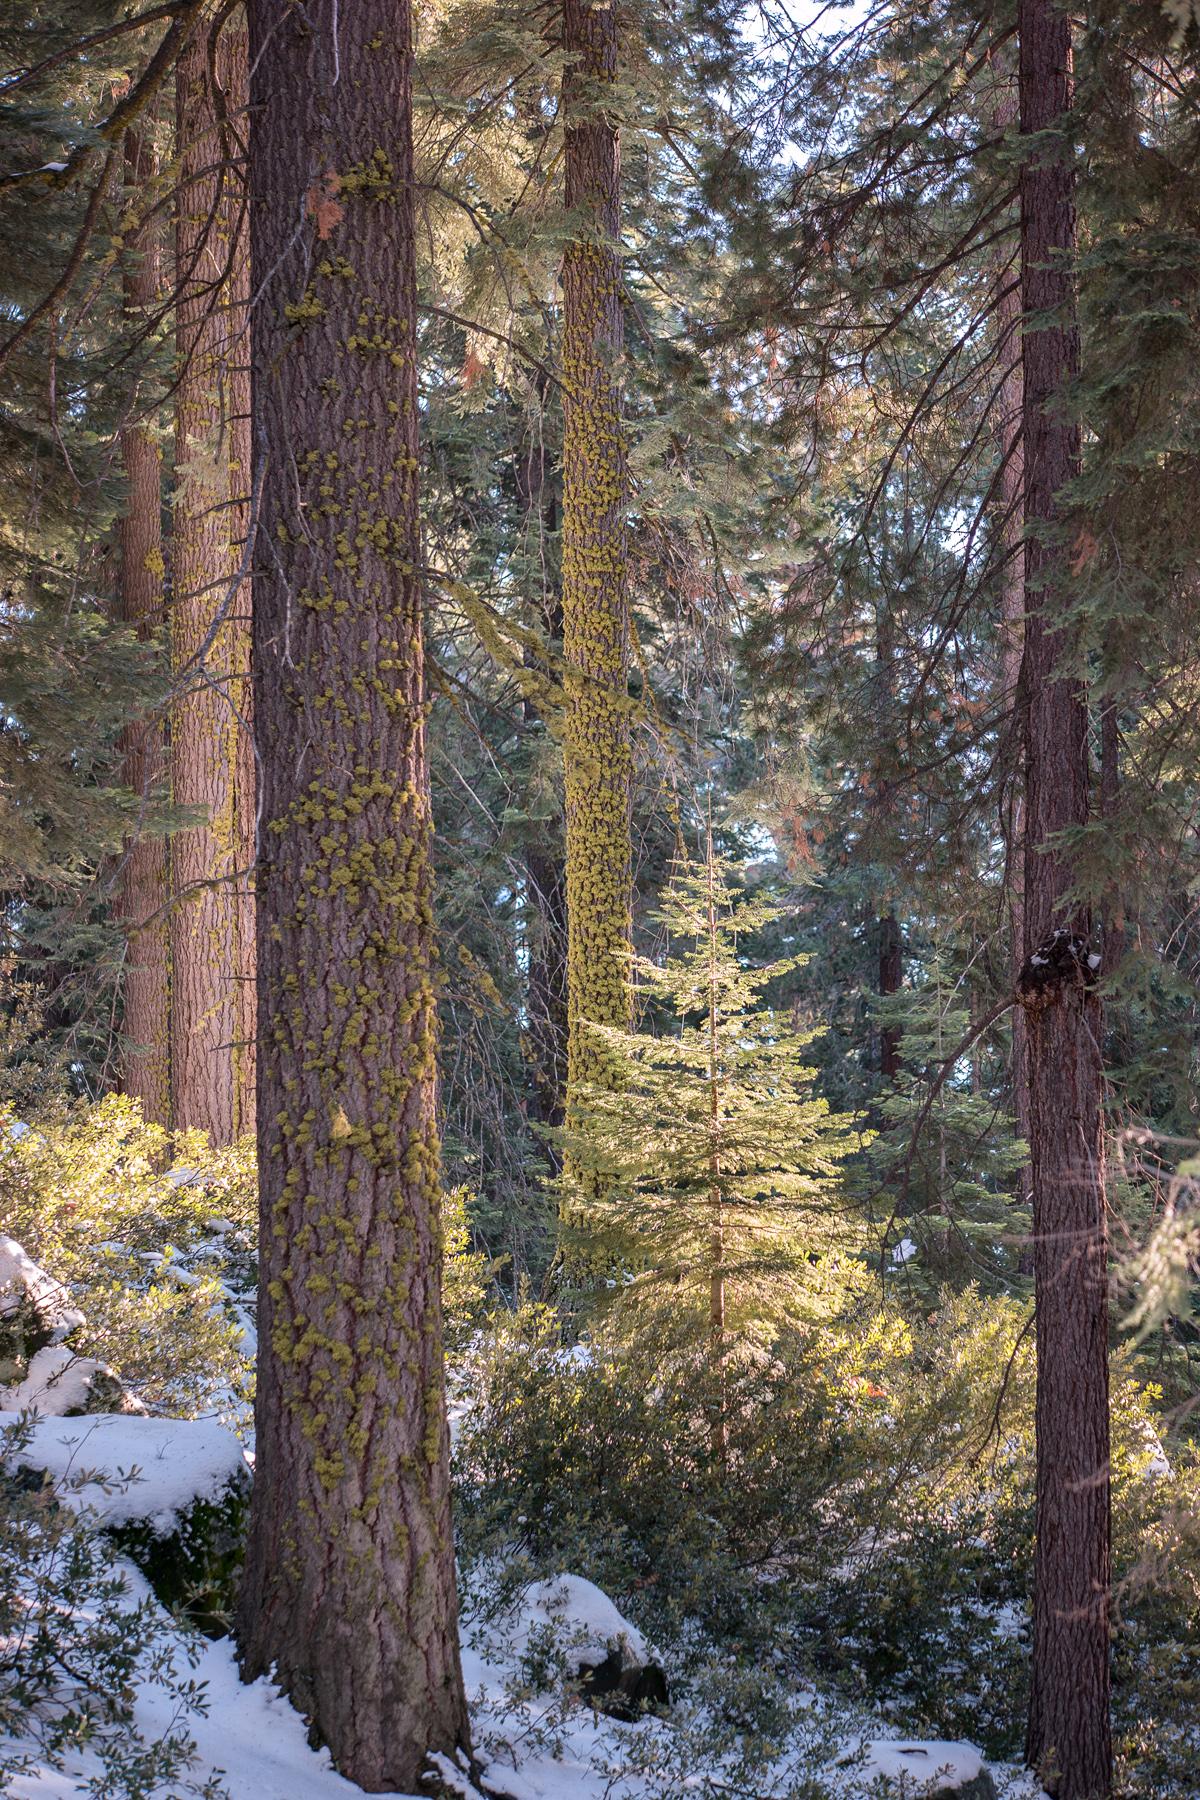 Wasim Muklashy Photography_Sequoia National Park_California_December 2015_-SAM_3974-Edit.jpg